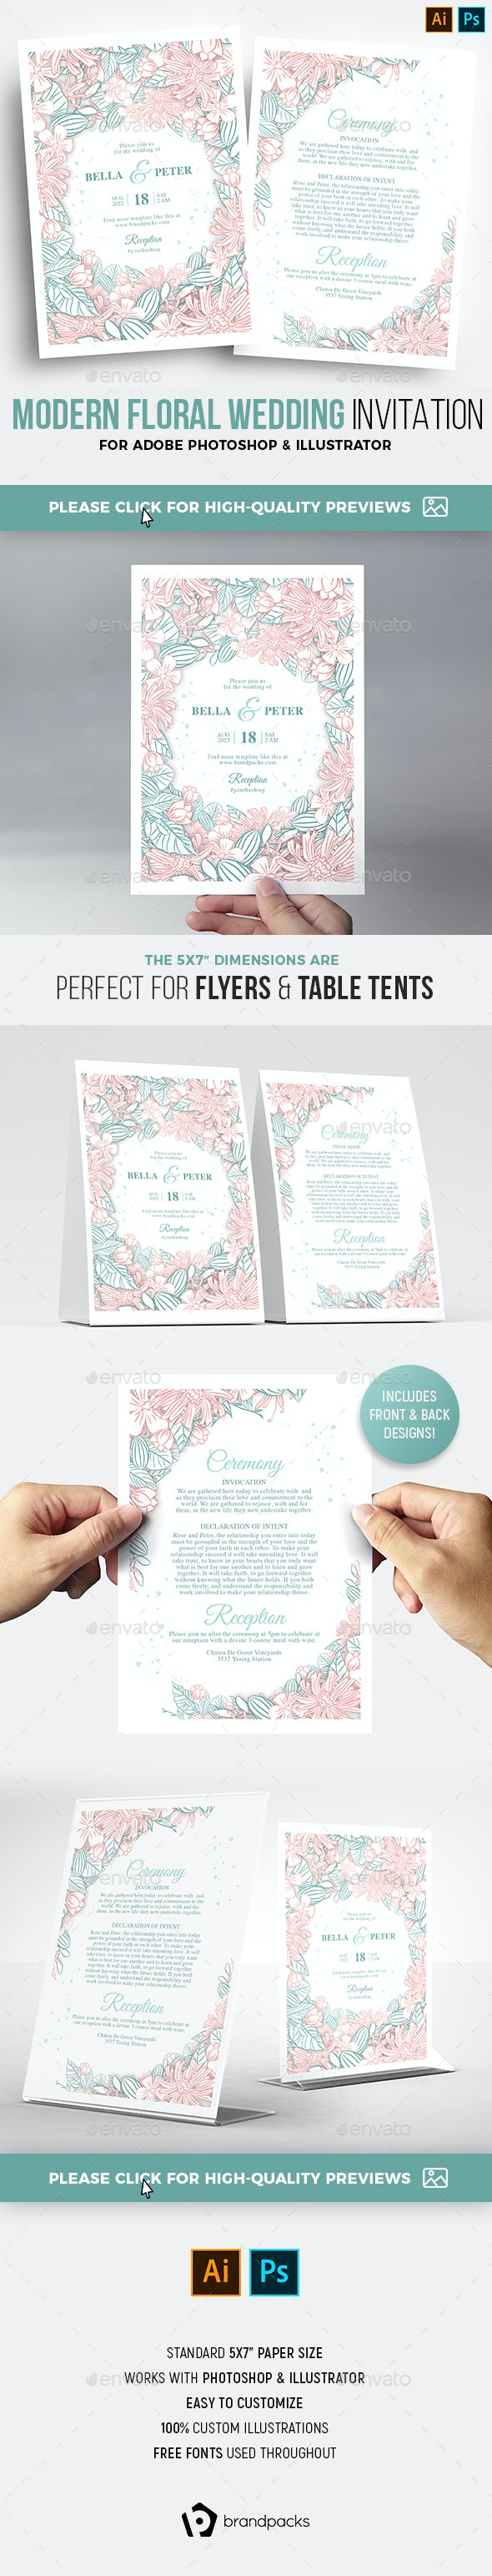 Floral Wedding Invitation / Flyer - Weddings Cards & Invites